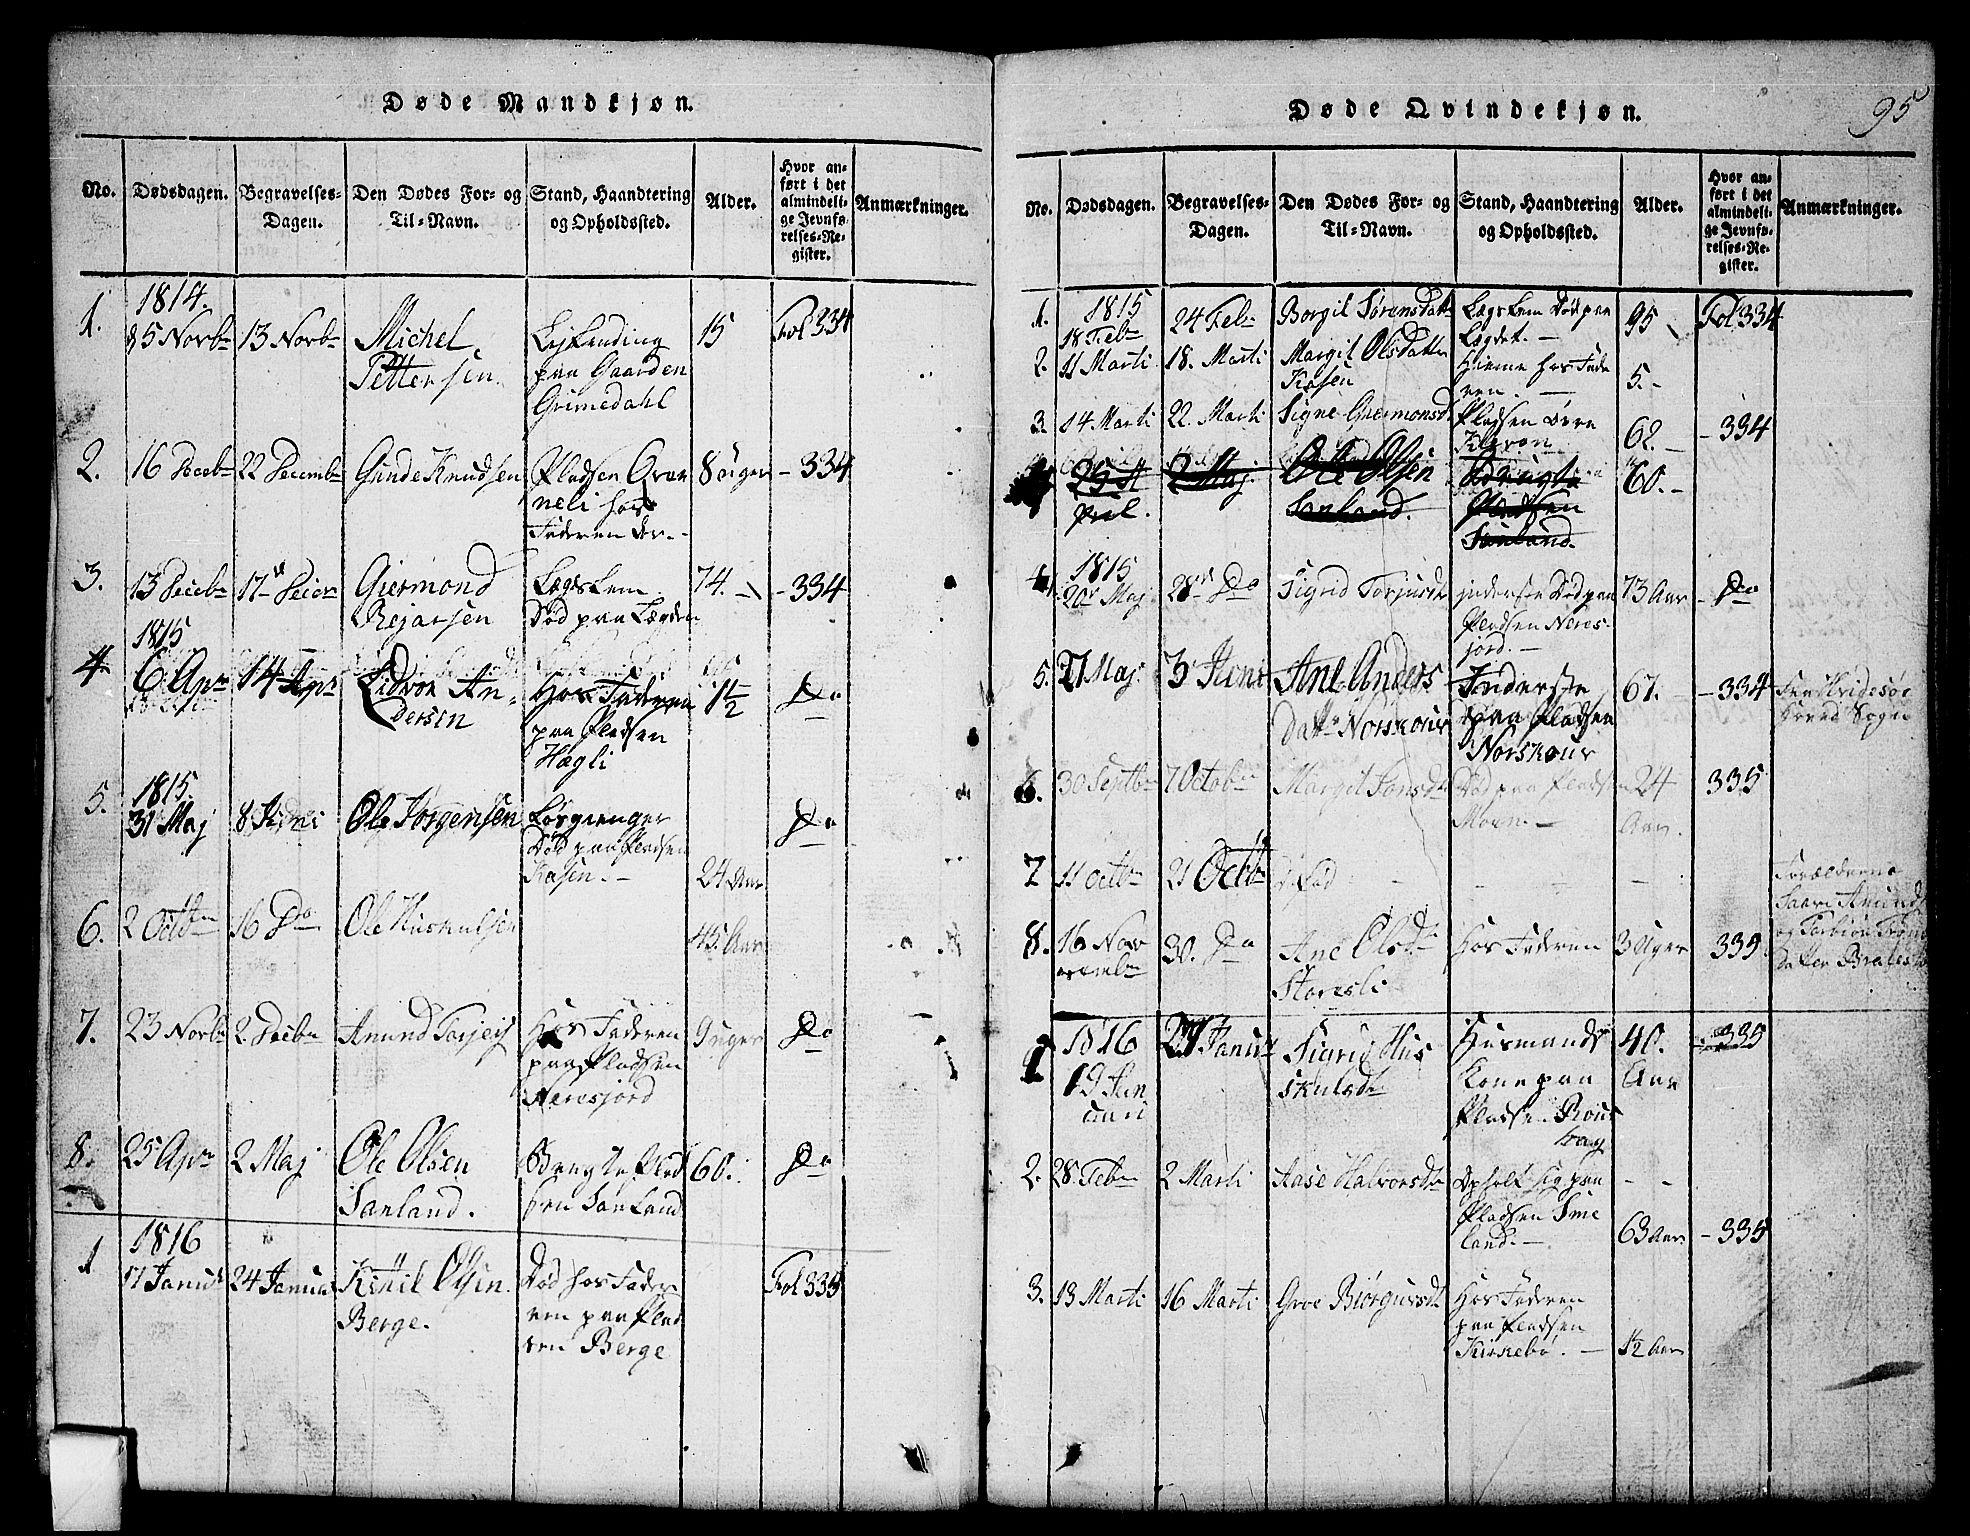 SAKO, Mo kirkebøker, G/Gb/L0001: Klokkerbok nr. II 1, 1814-1843, s. 95